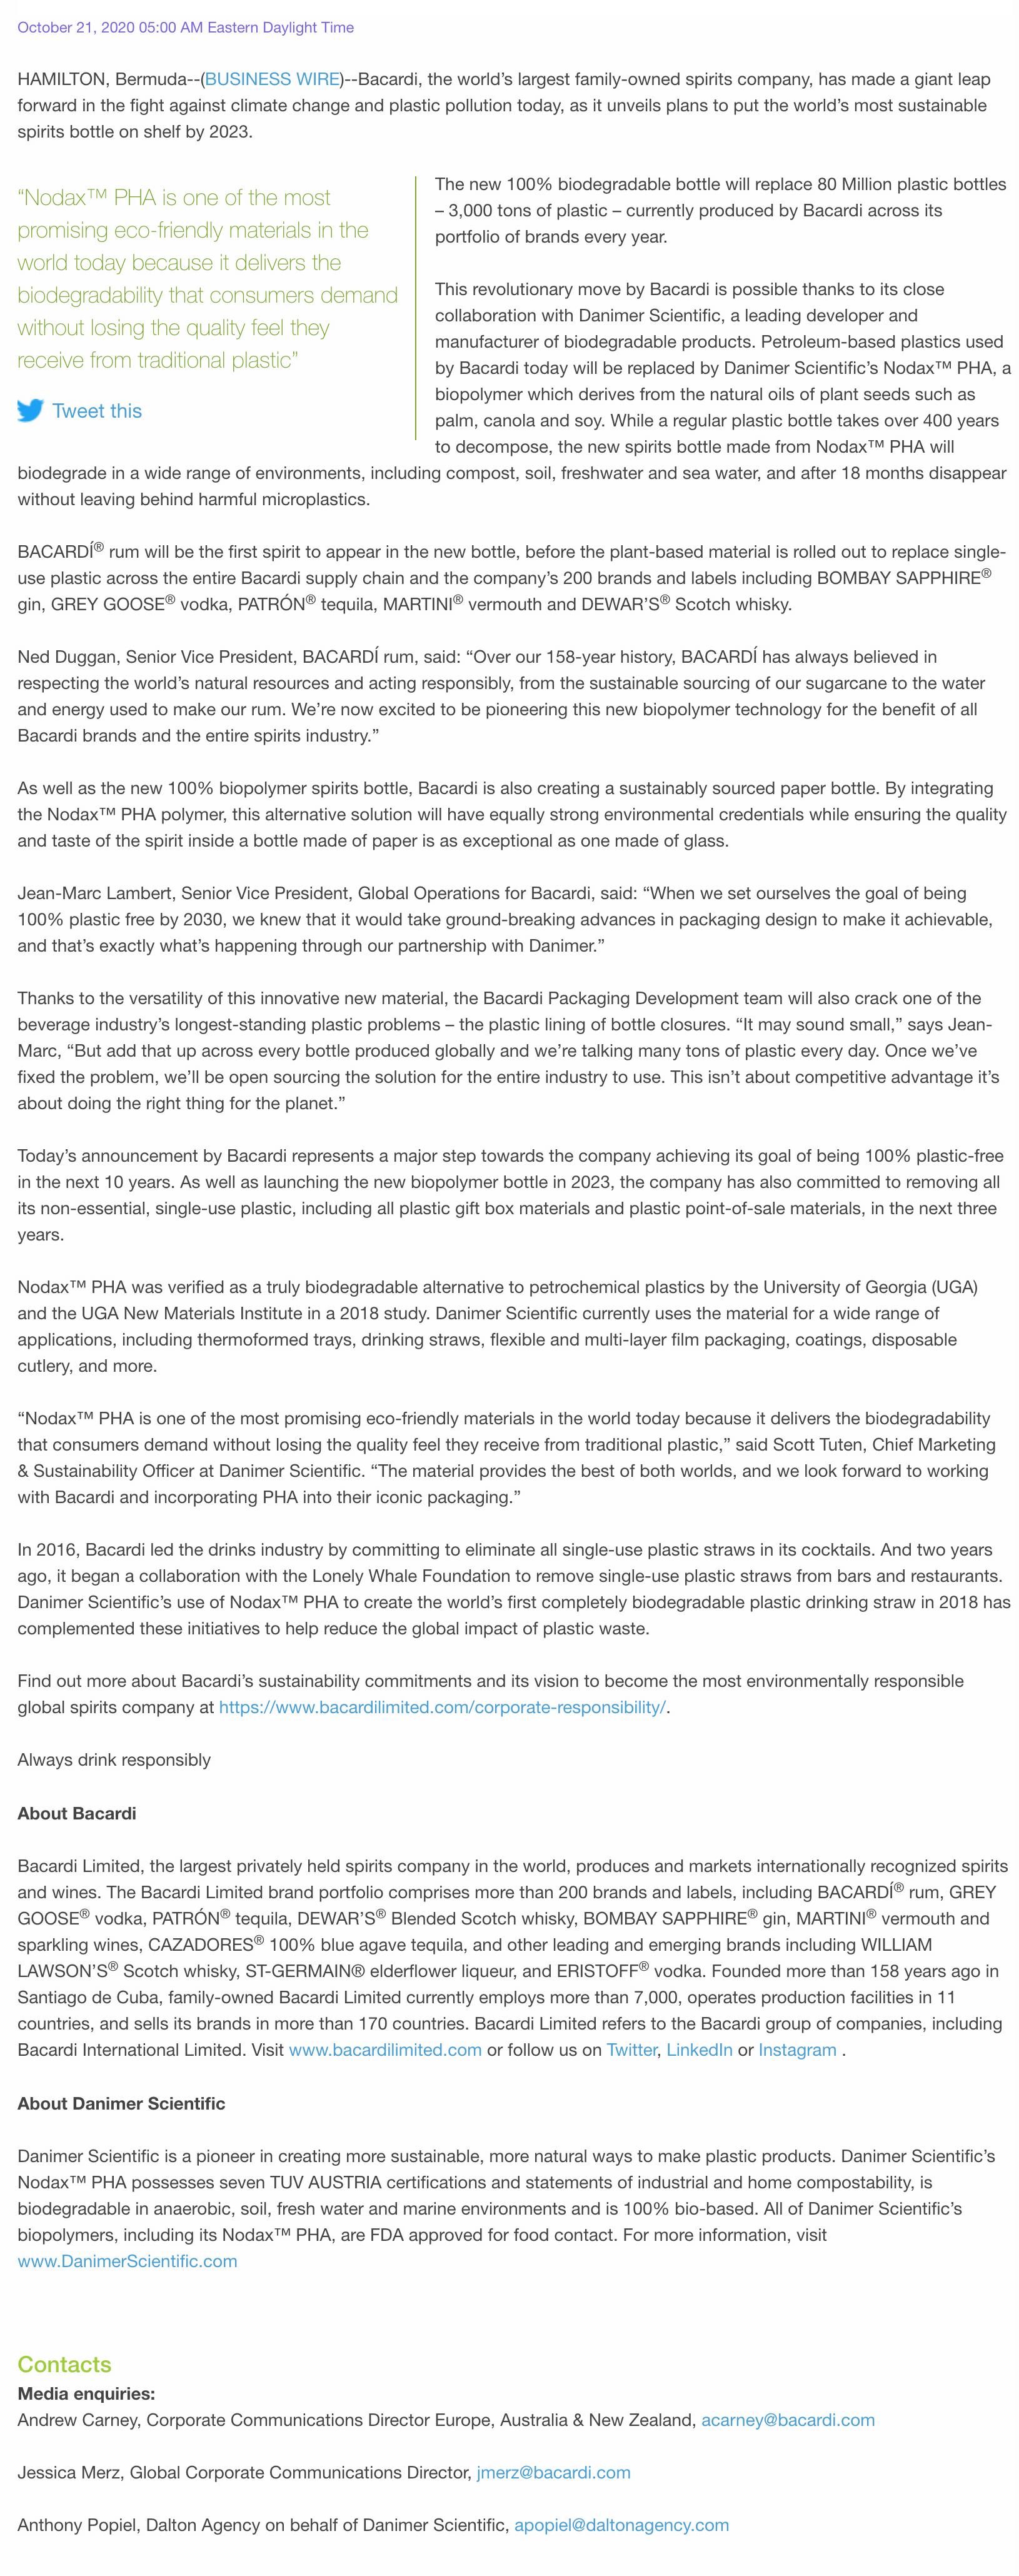 Bacardi press release